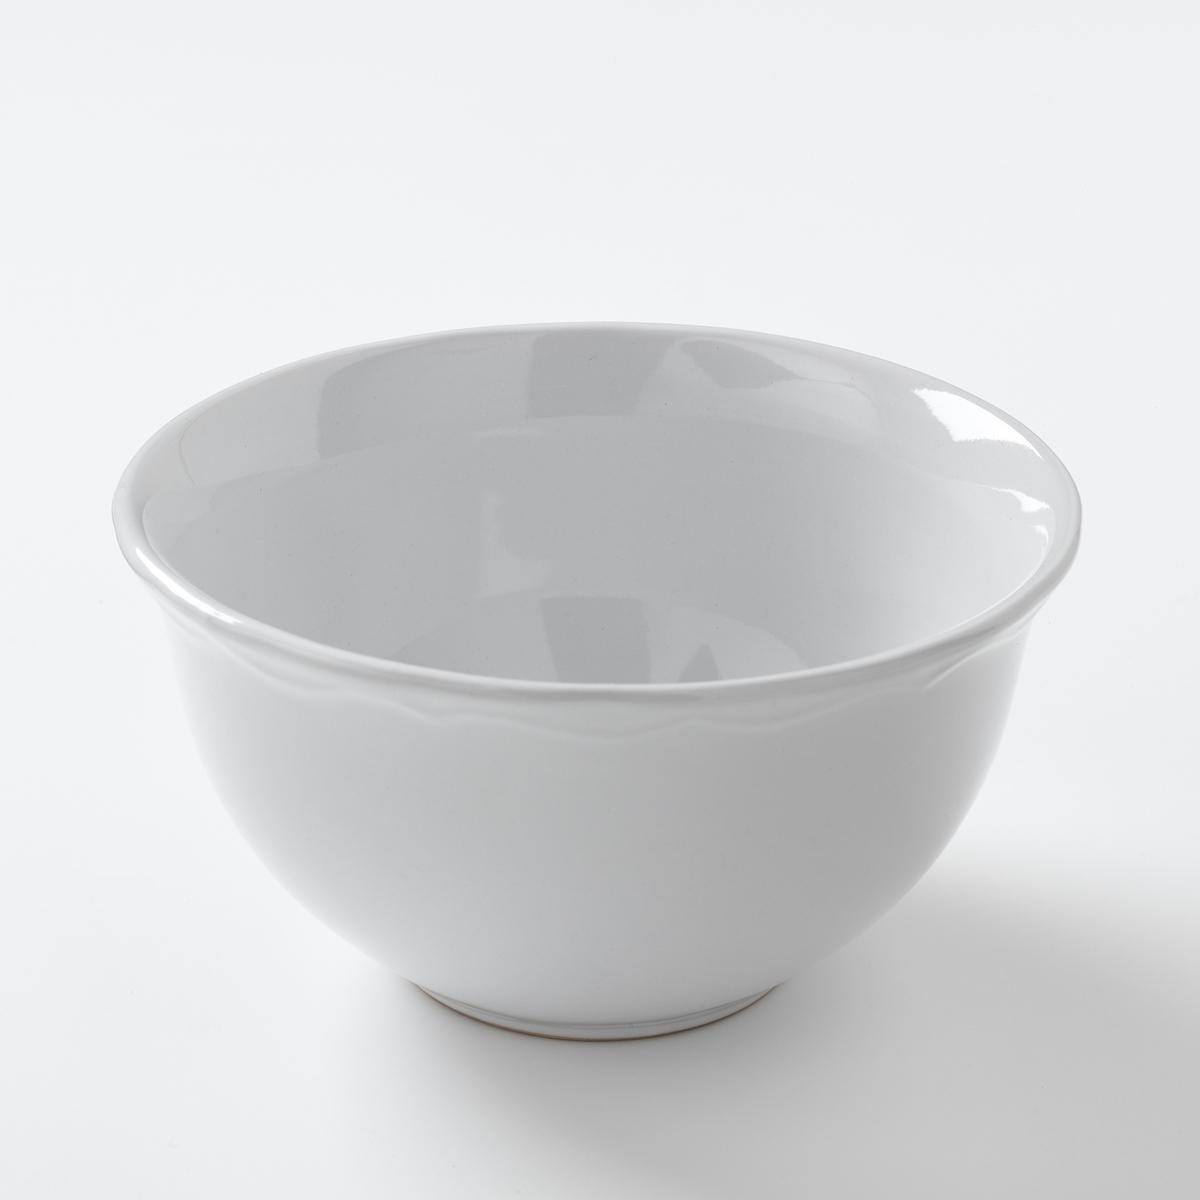 Комплект из 4 чашек из фаянса с отделкой фестоном, AJILA ваза из фаянса catalpa